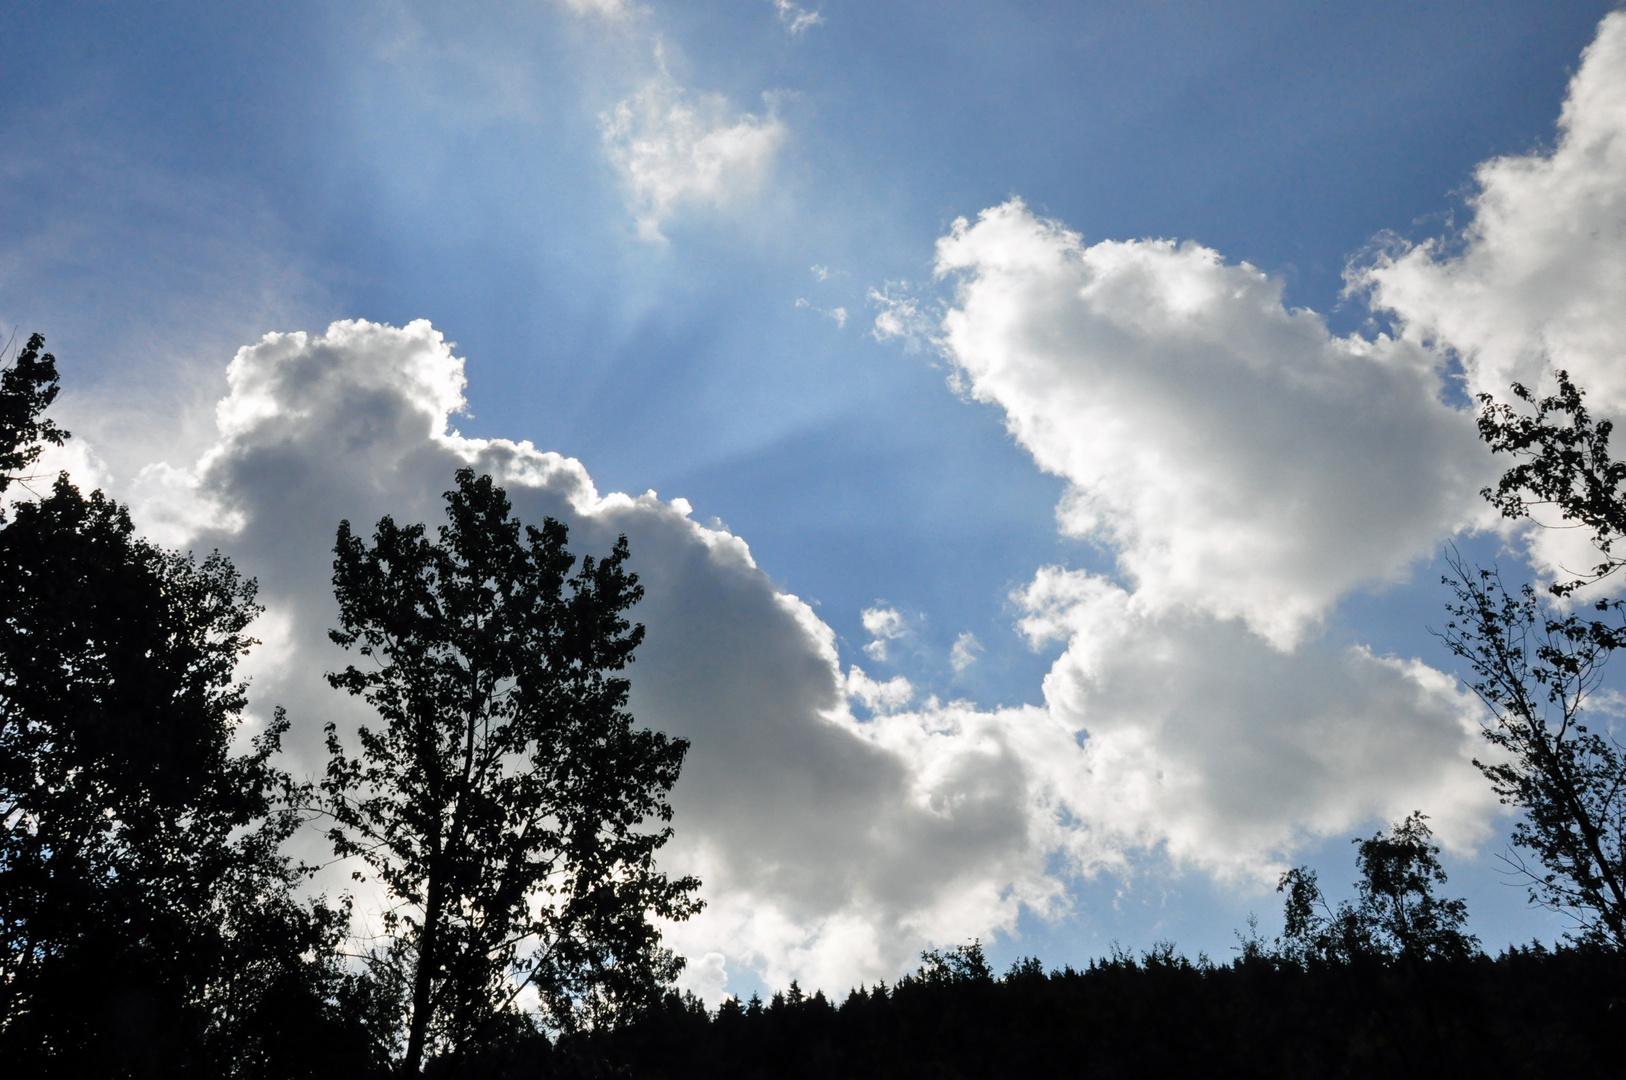 Die Cumuluswolken gestern über dem Wehebachtal